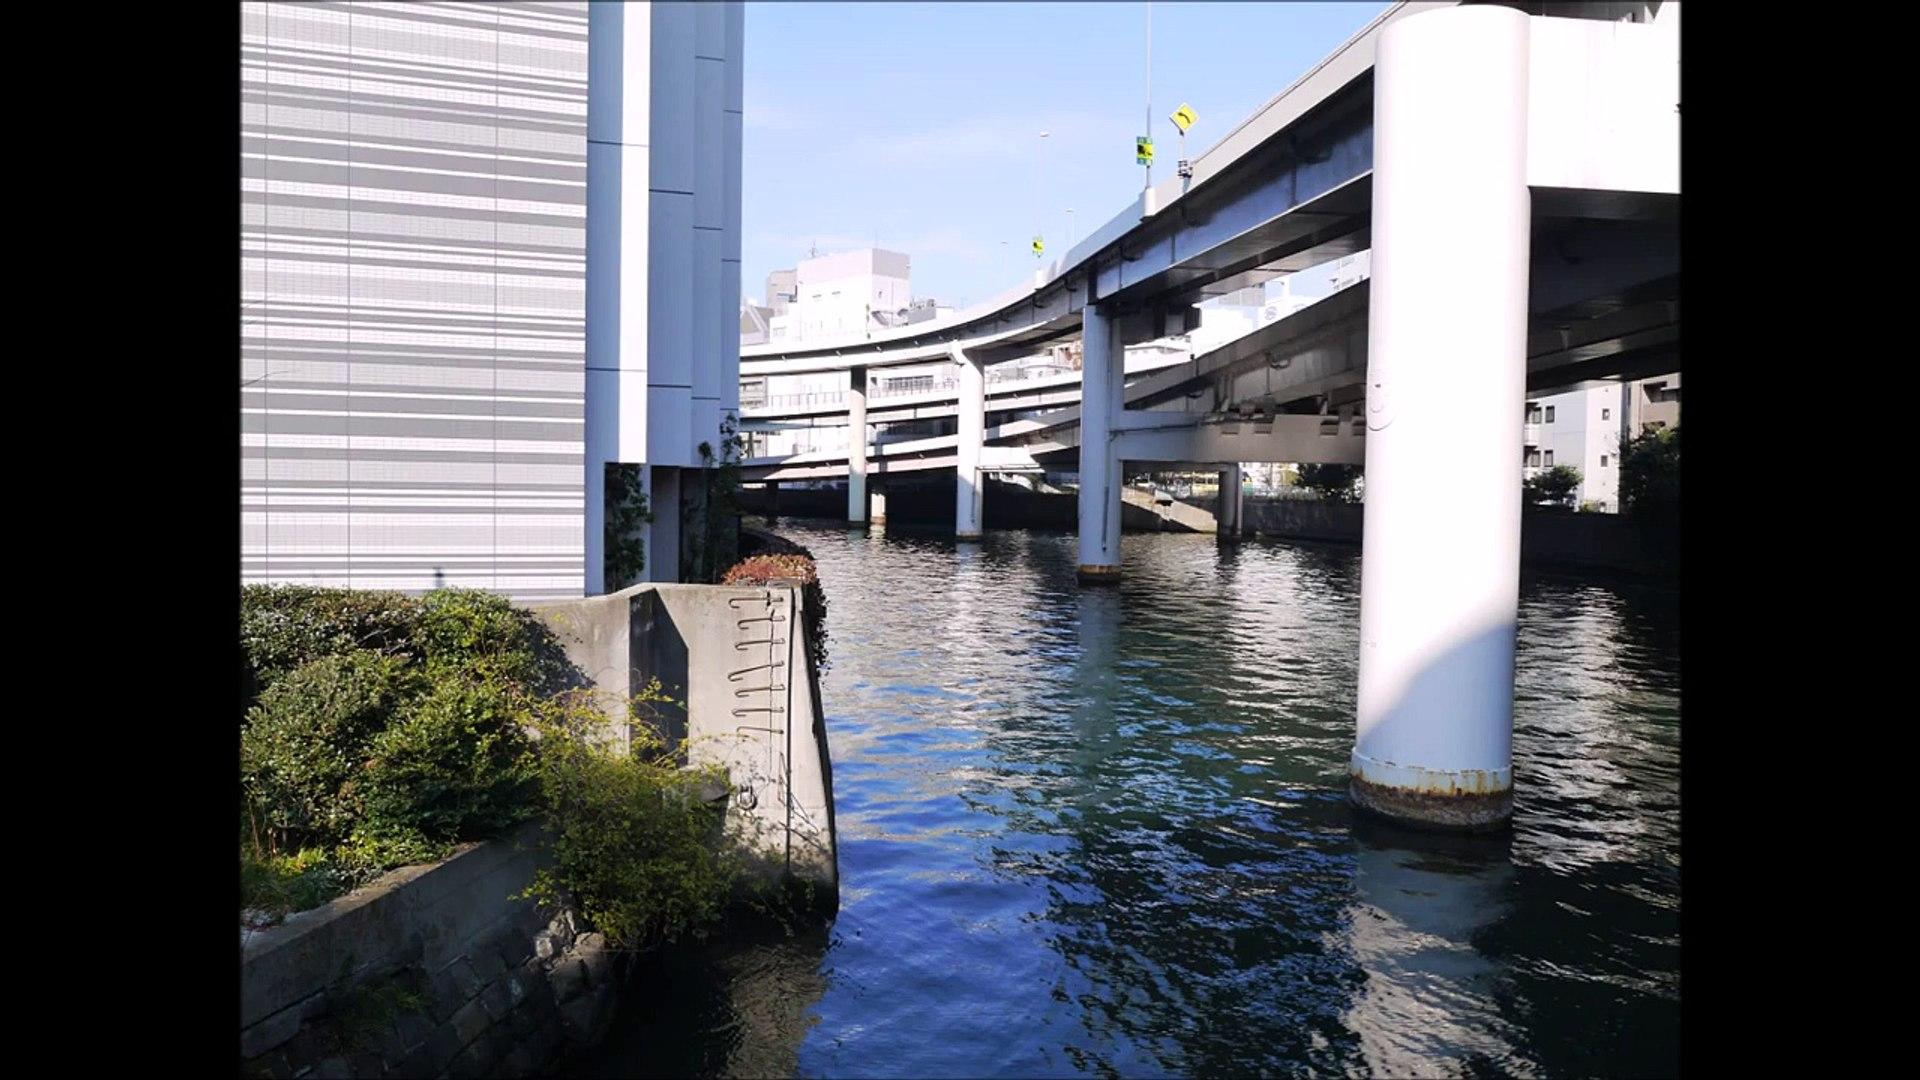 【Tokyo Walk-10】KABUTO-Cho & NIHON-Bashi; Center of Japanese Economy【for TOKYO2020 Olympic Games)